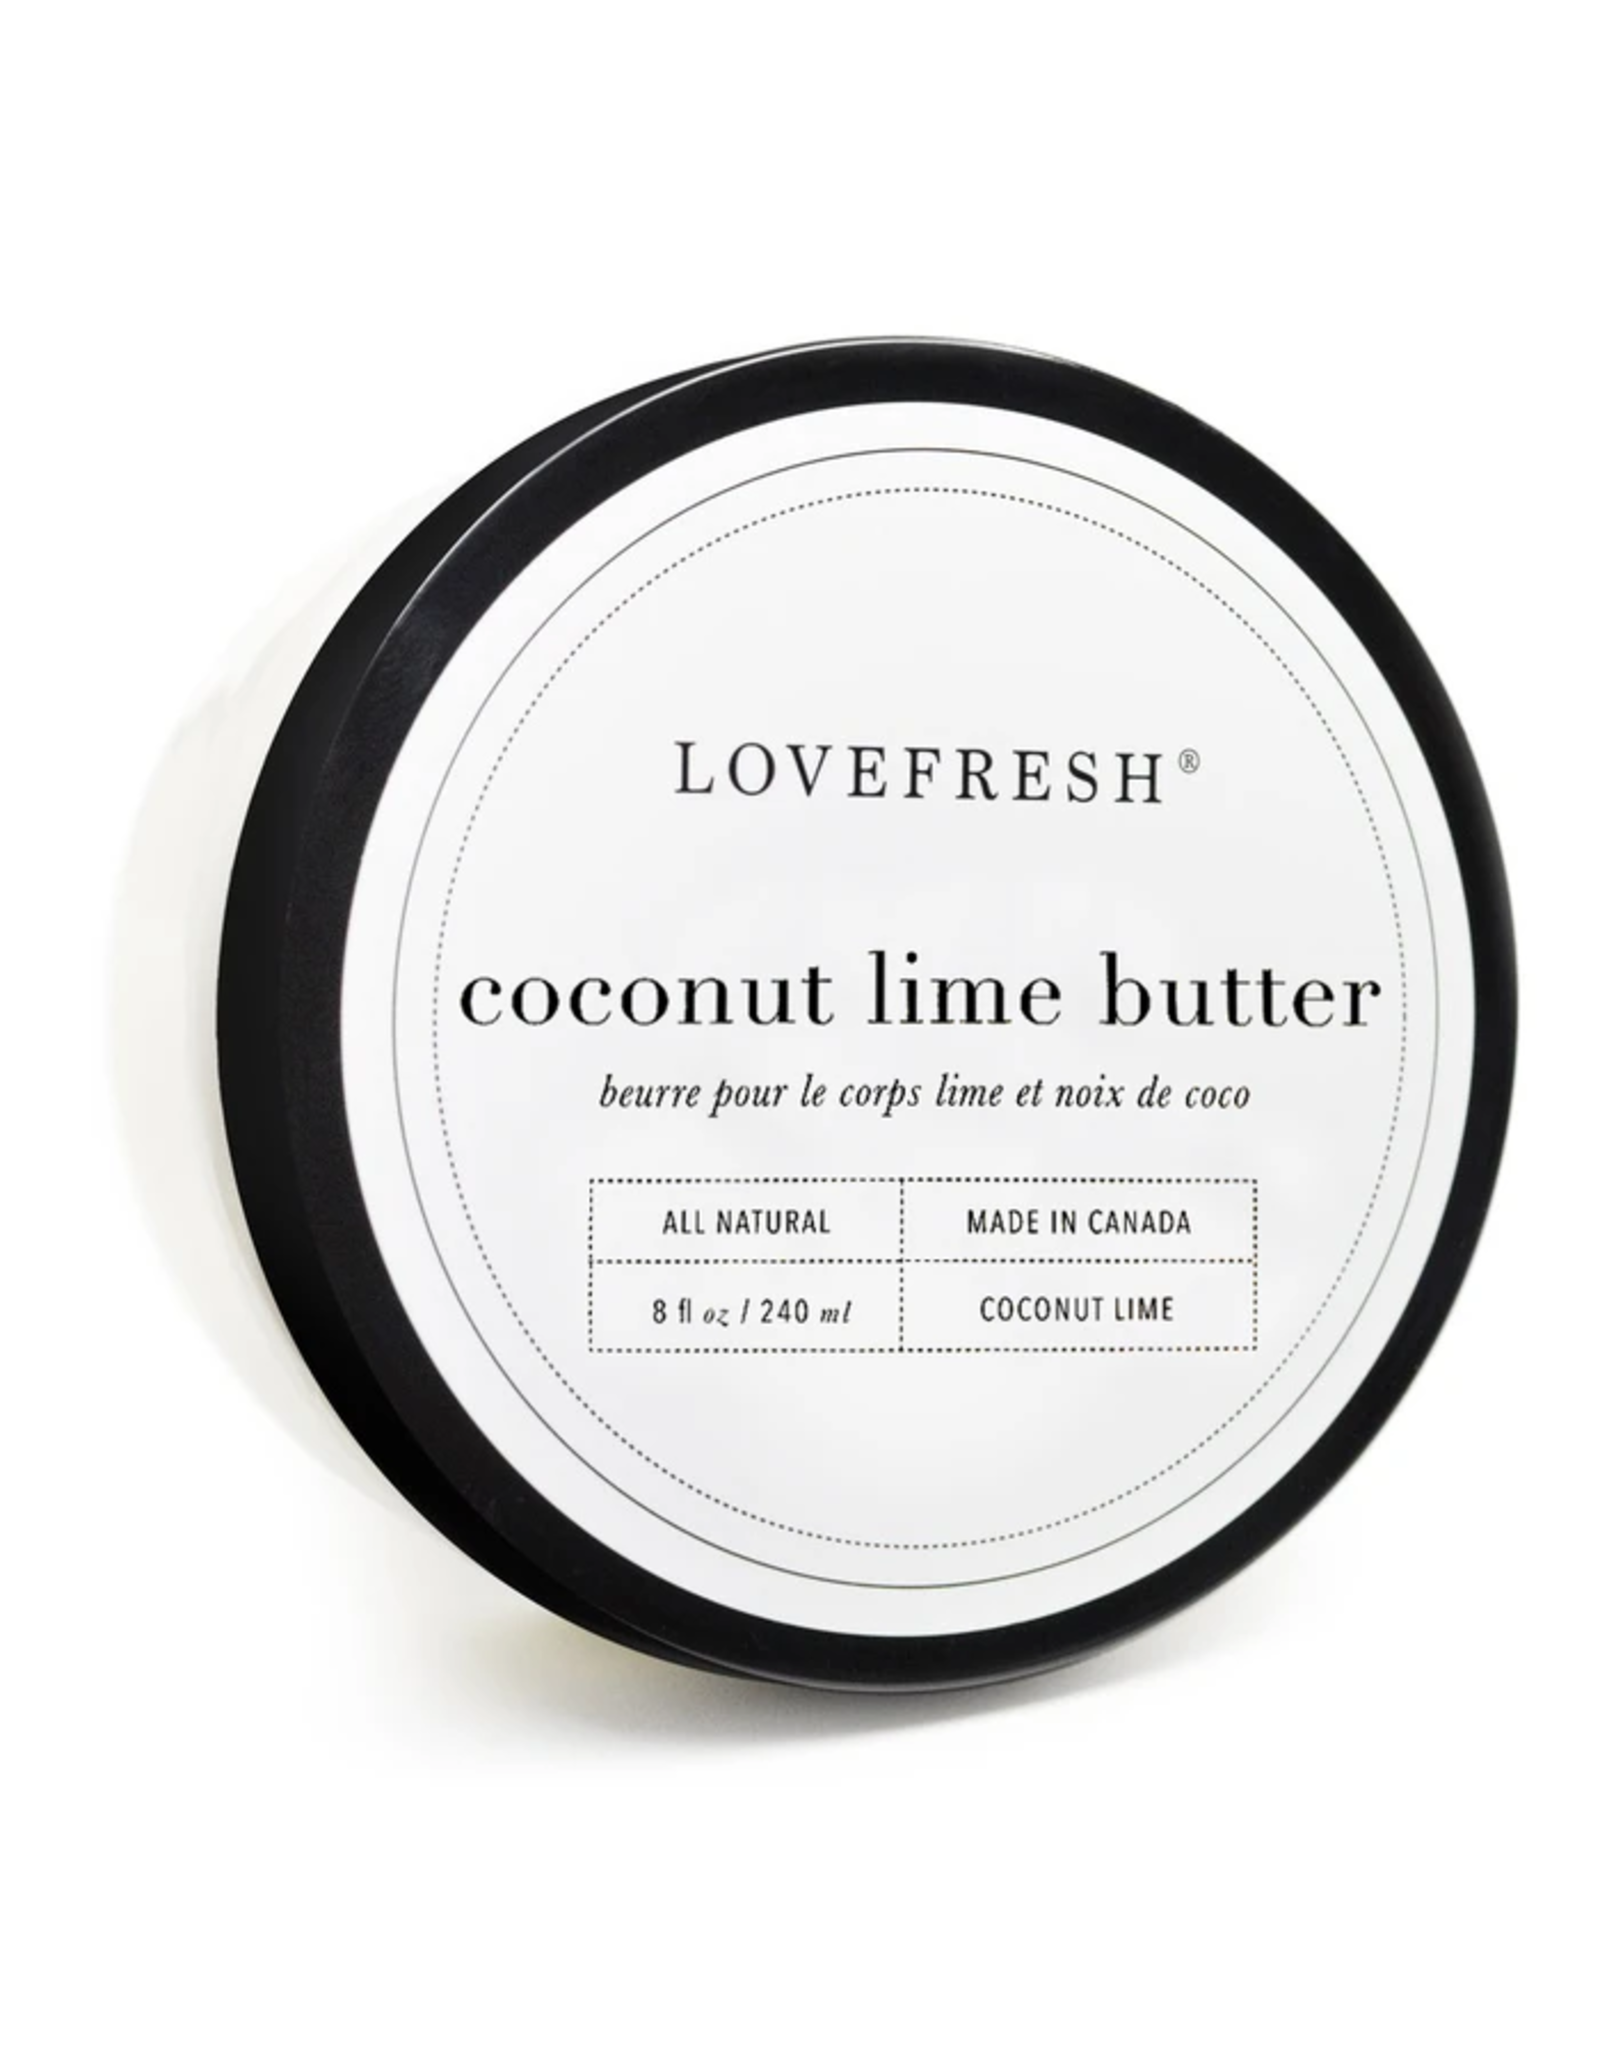 Lovefresh Body Butter